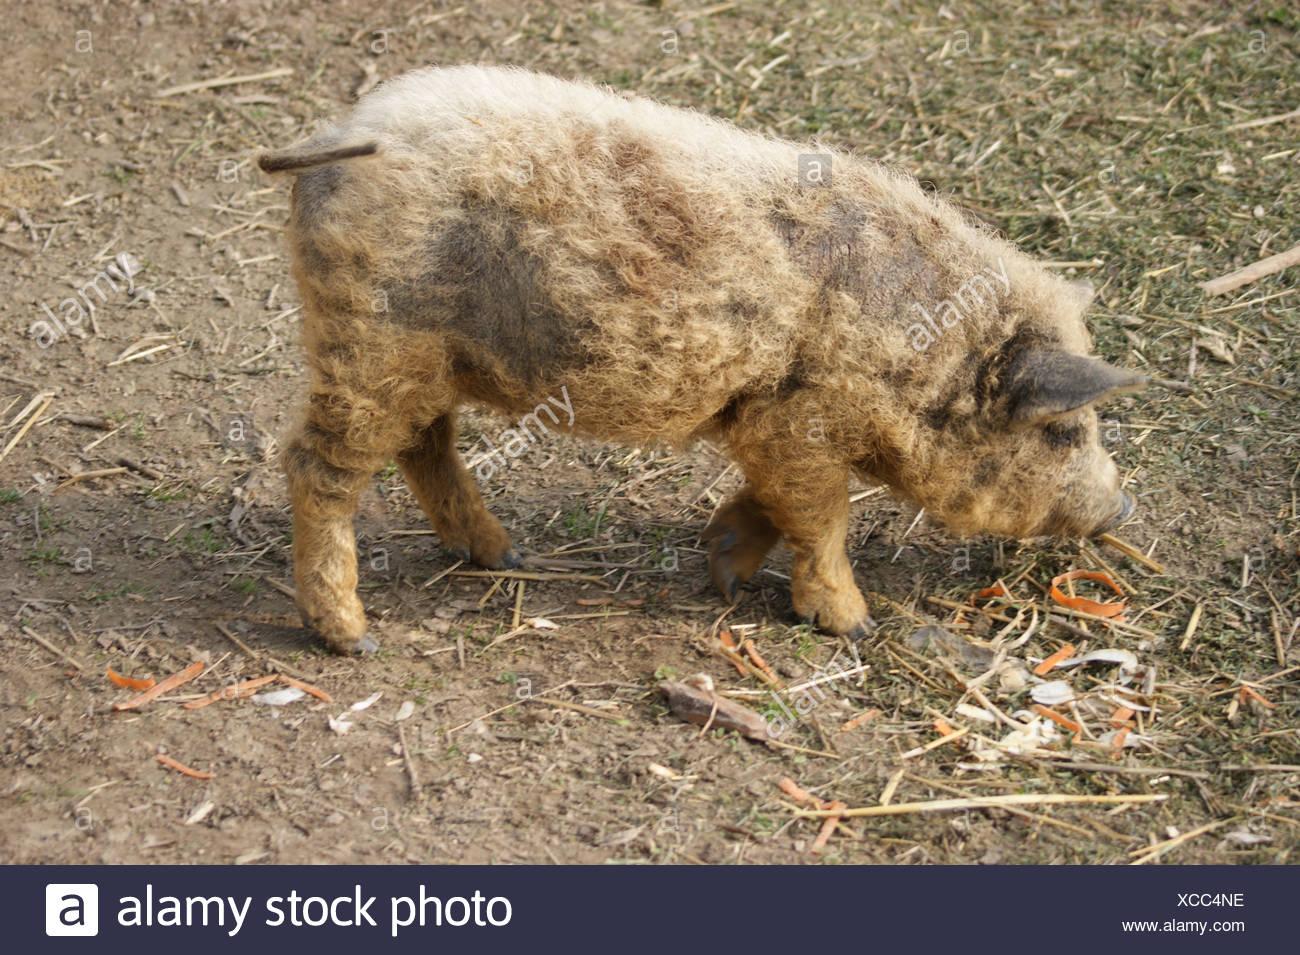 Hungarian mangalitsa pig, a very curly haired animal - Stock Image